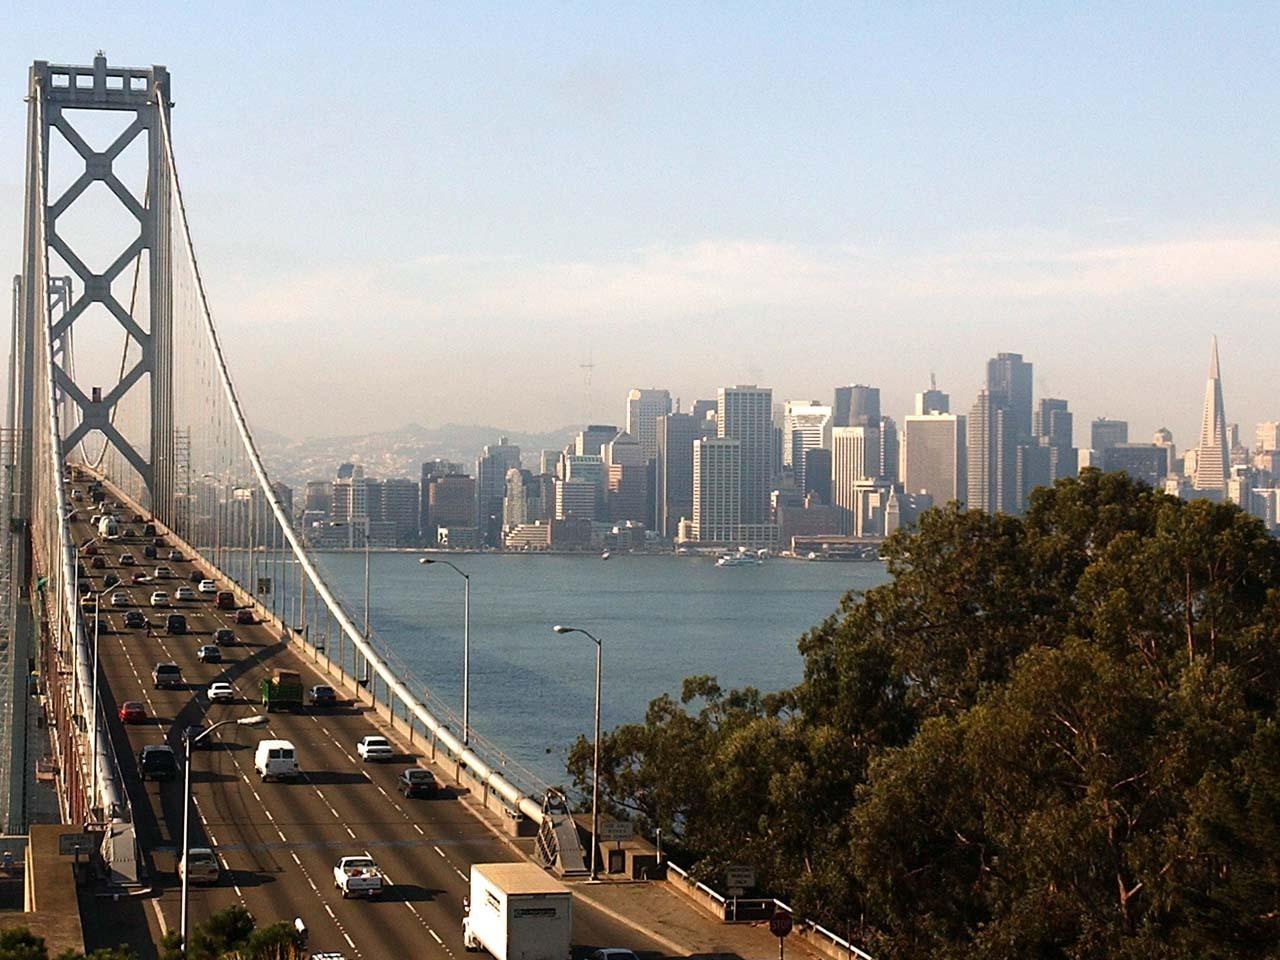 Americas richest cities in 2013 americas richest cities for Top richest cities in california